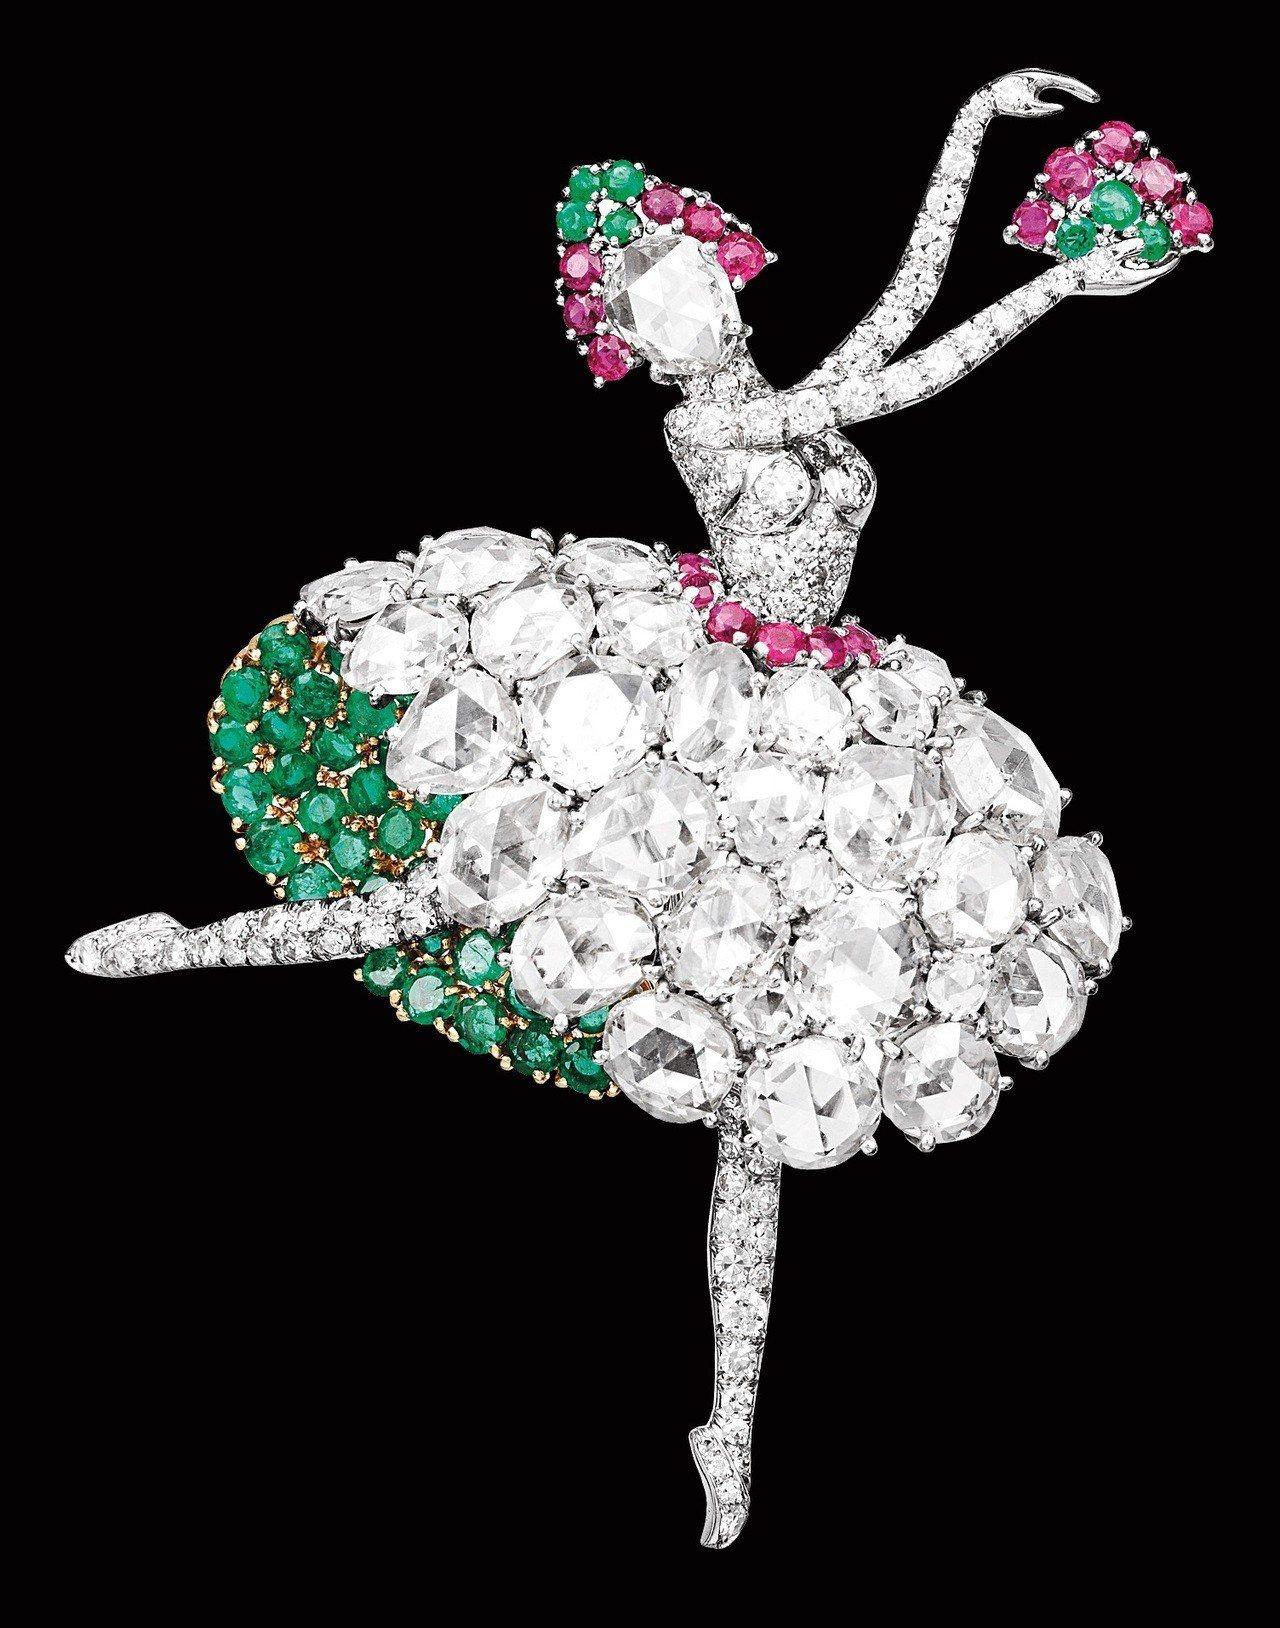 Danseuse Espagnole胸針,1941年,是梵克雅寶最早期的芭蕾舞伶...